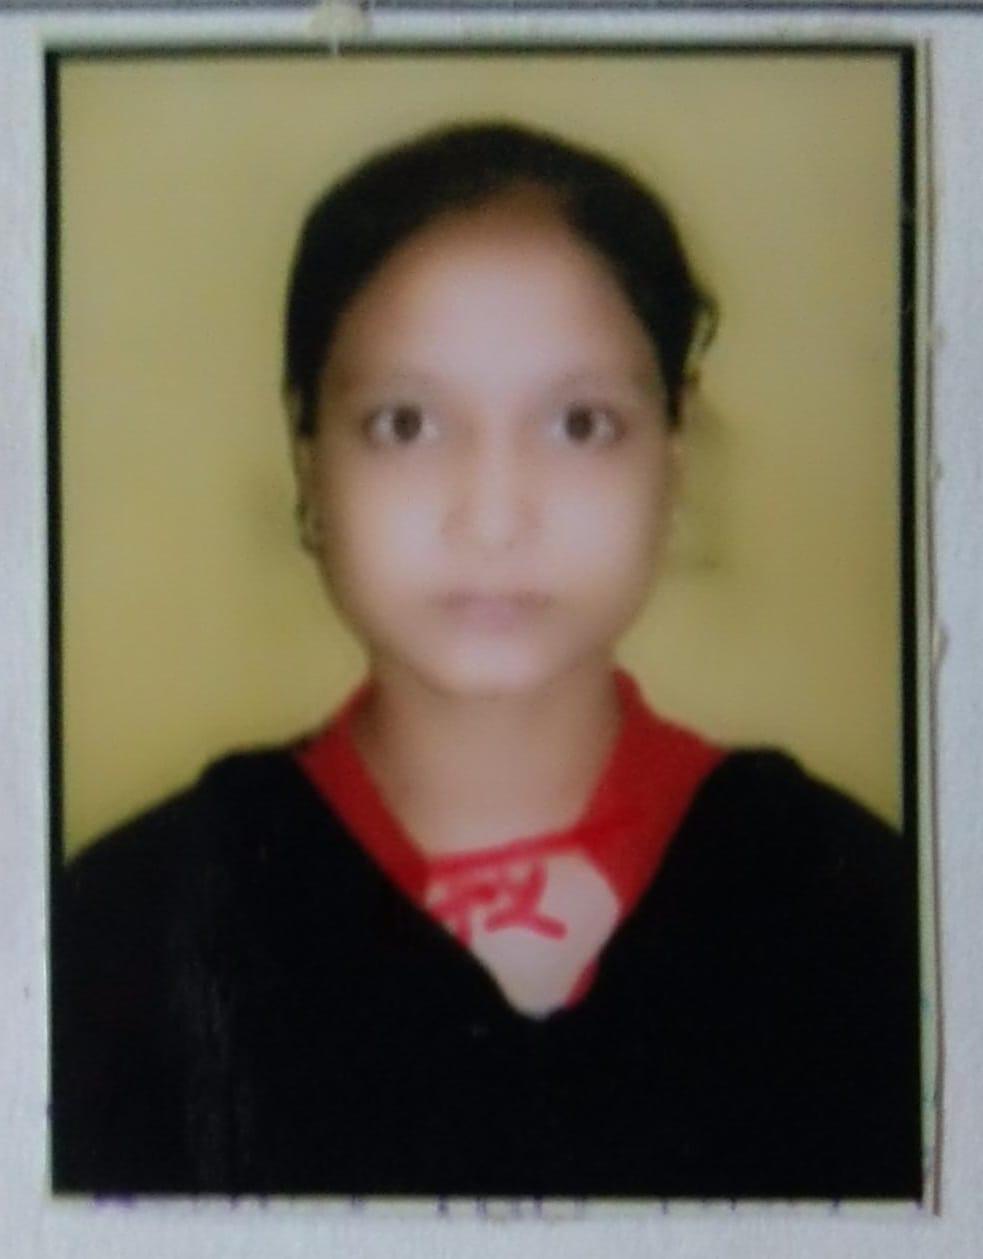 Khushnuma student dkpgc